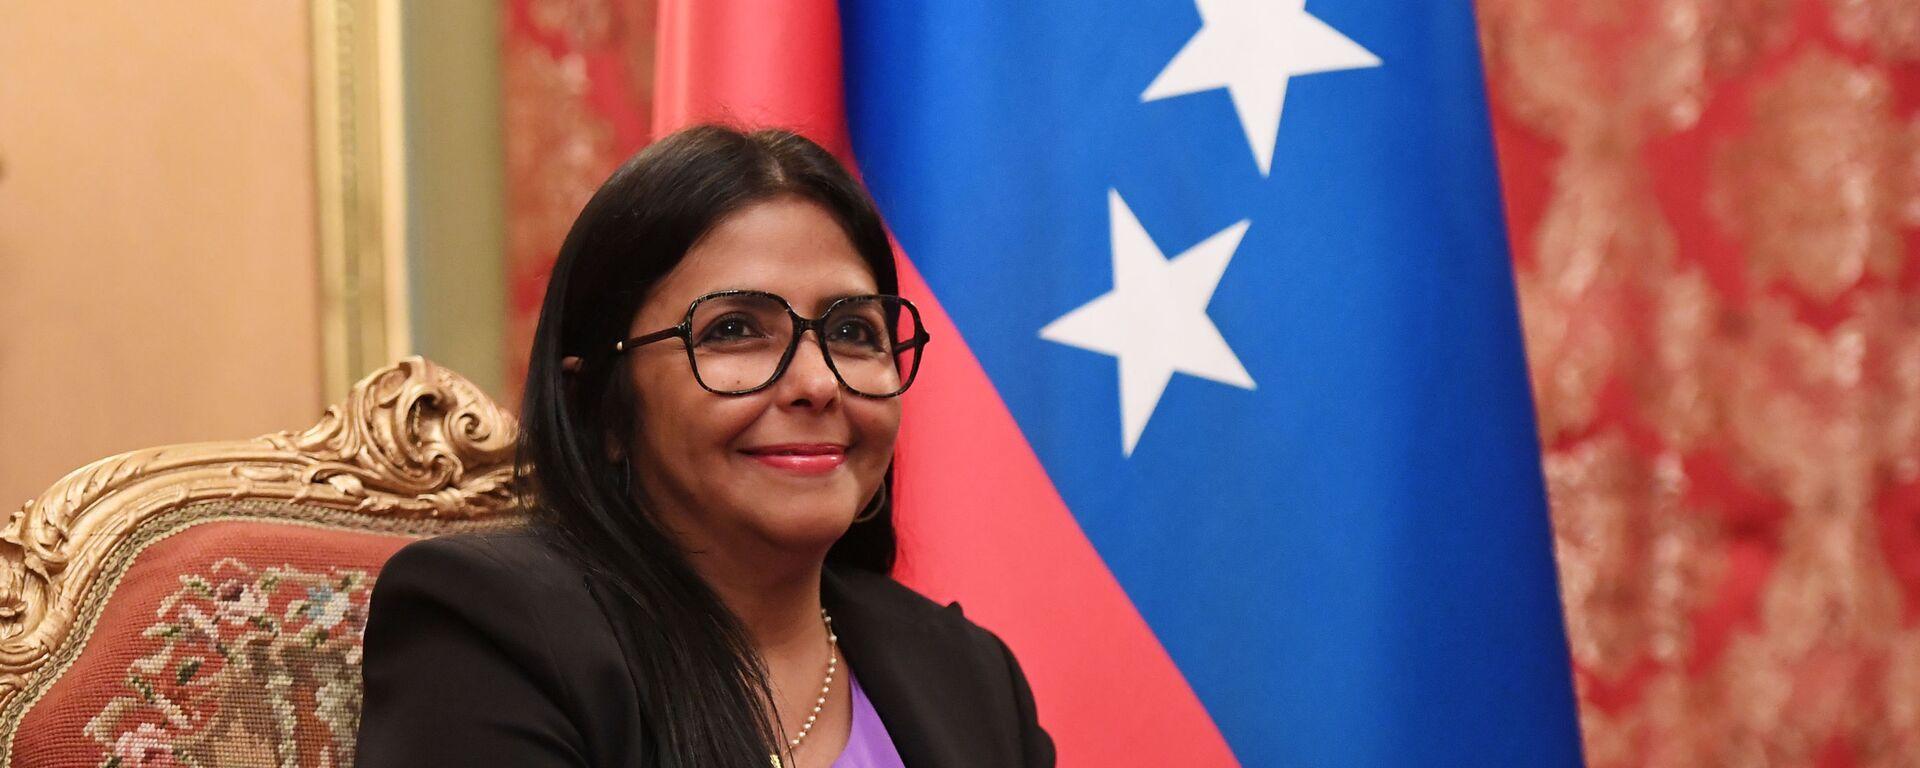 Delcy Rodríguez, vicepresidenta de Venezuela - Sputnik Mundo, 1920, 18.08.2021